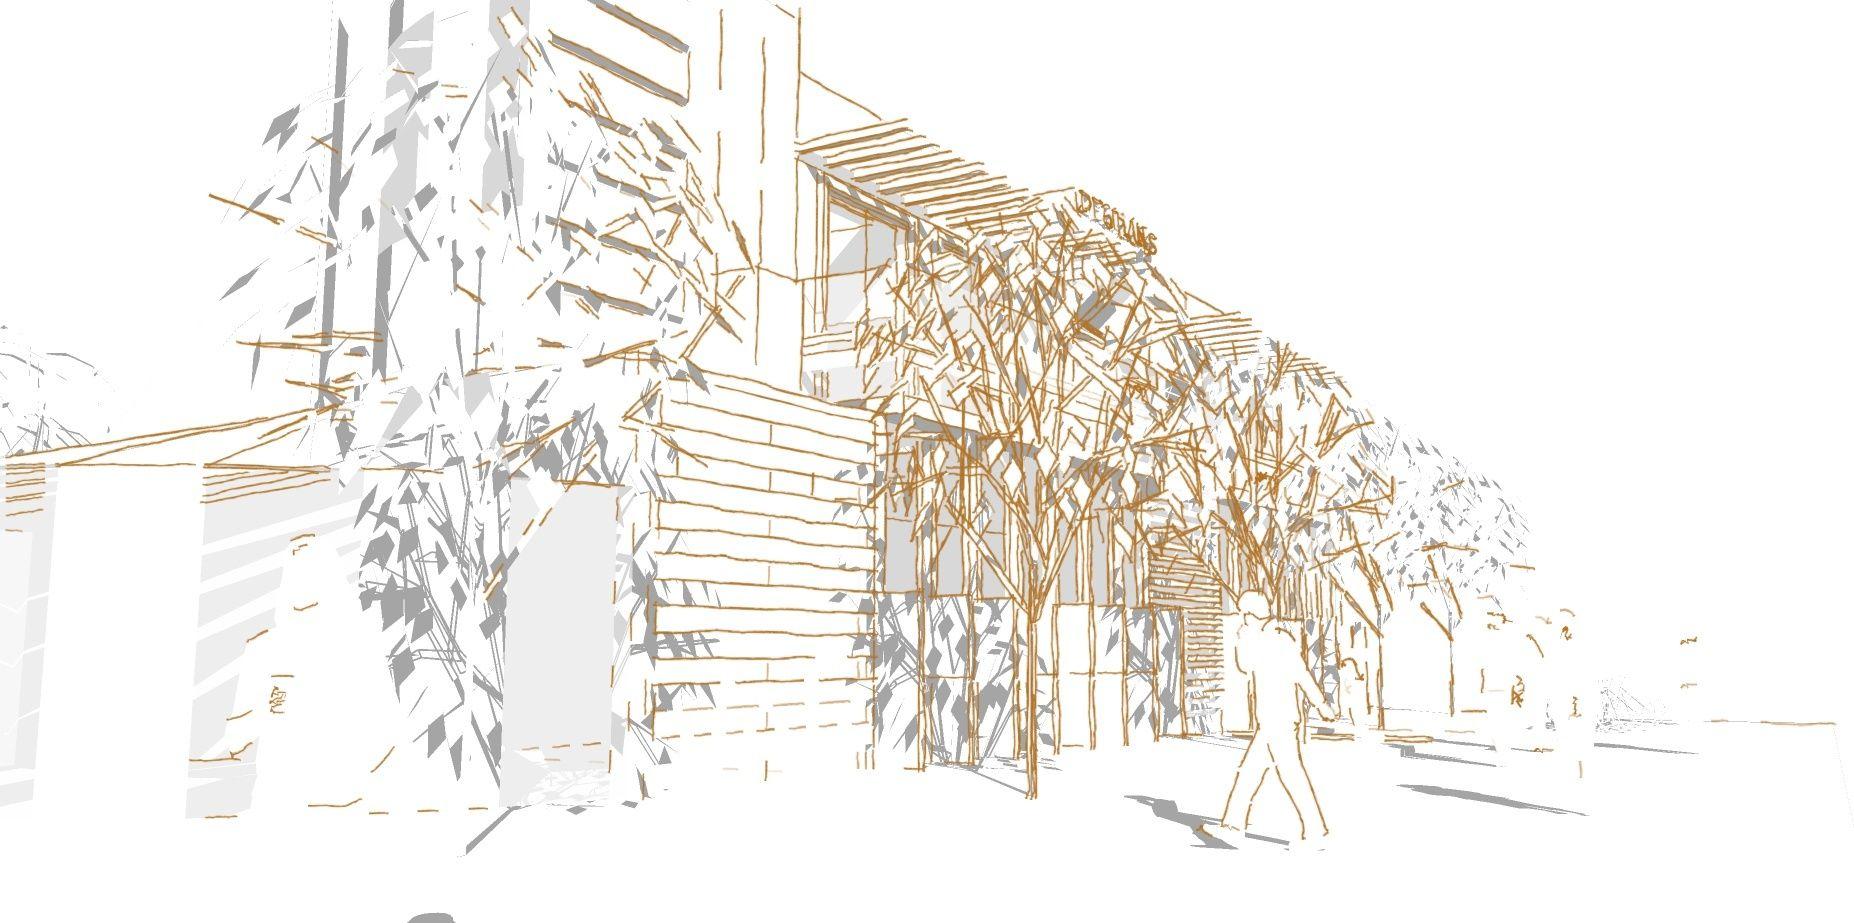 SketchUp'eur architecte -AnthO'- - Page 4 Debian16